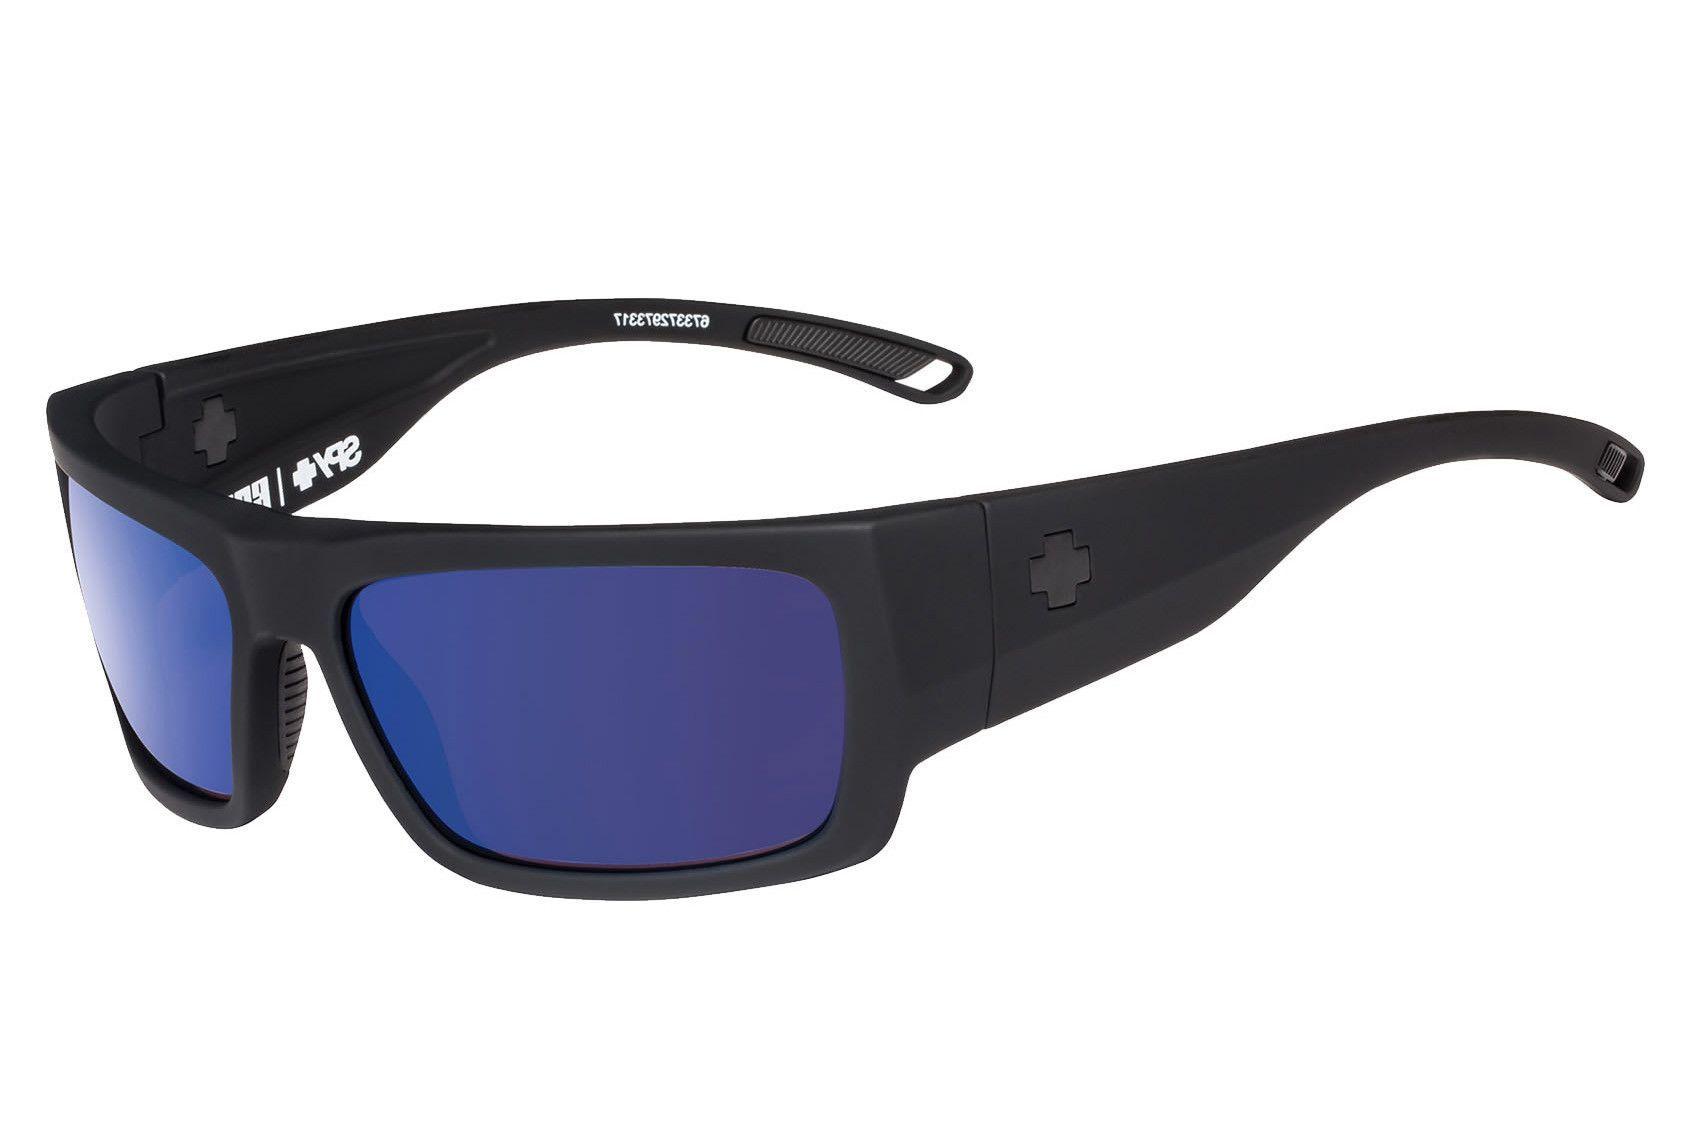 f5205d52b6 Spy - Rover Soft Matte Black Sunglasses